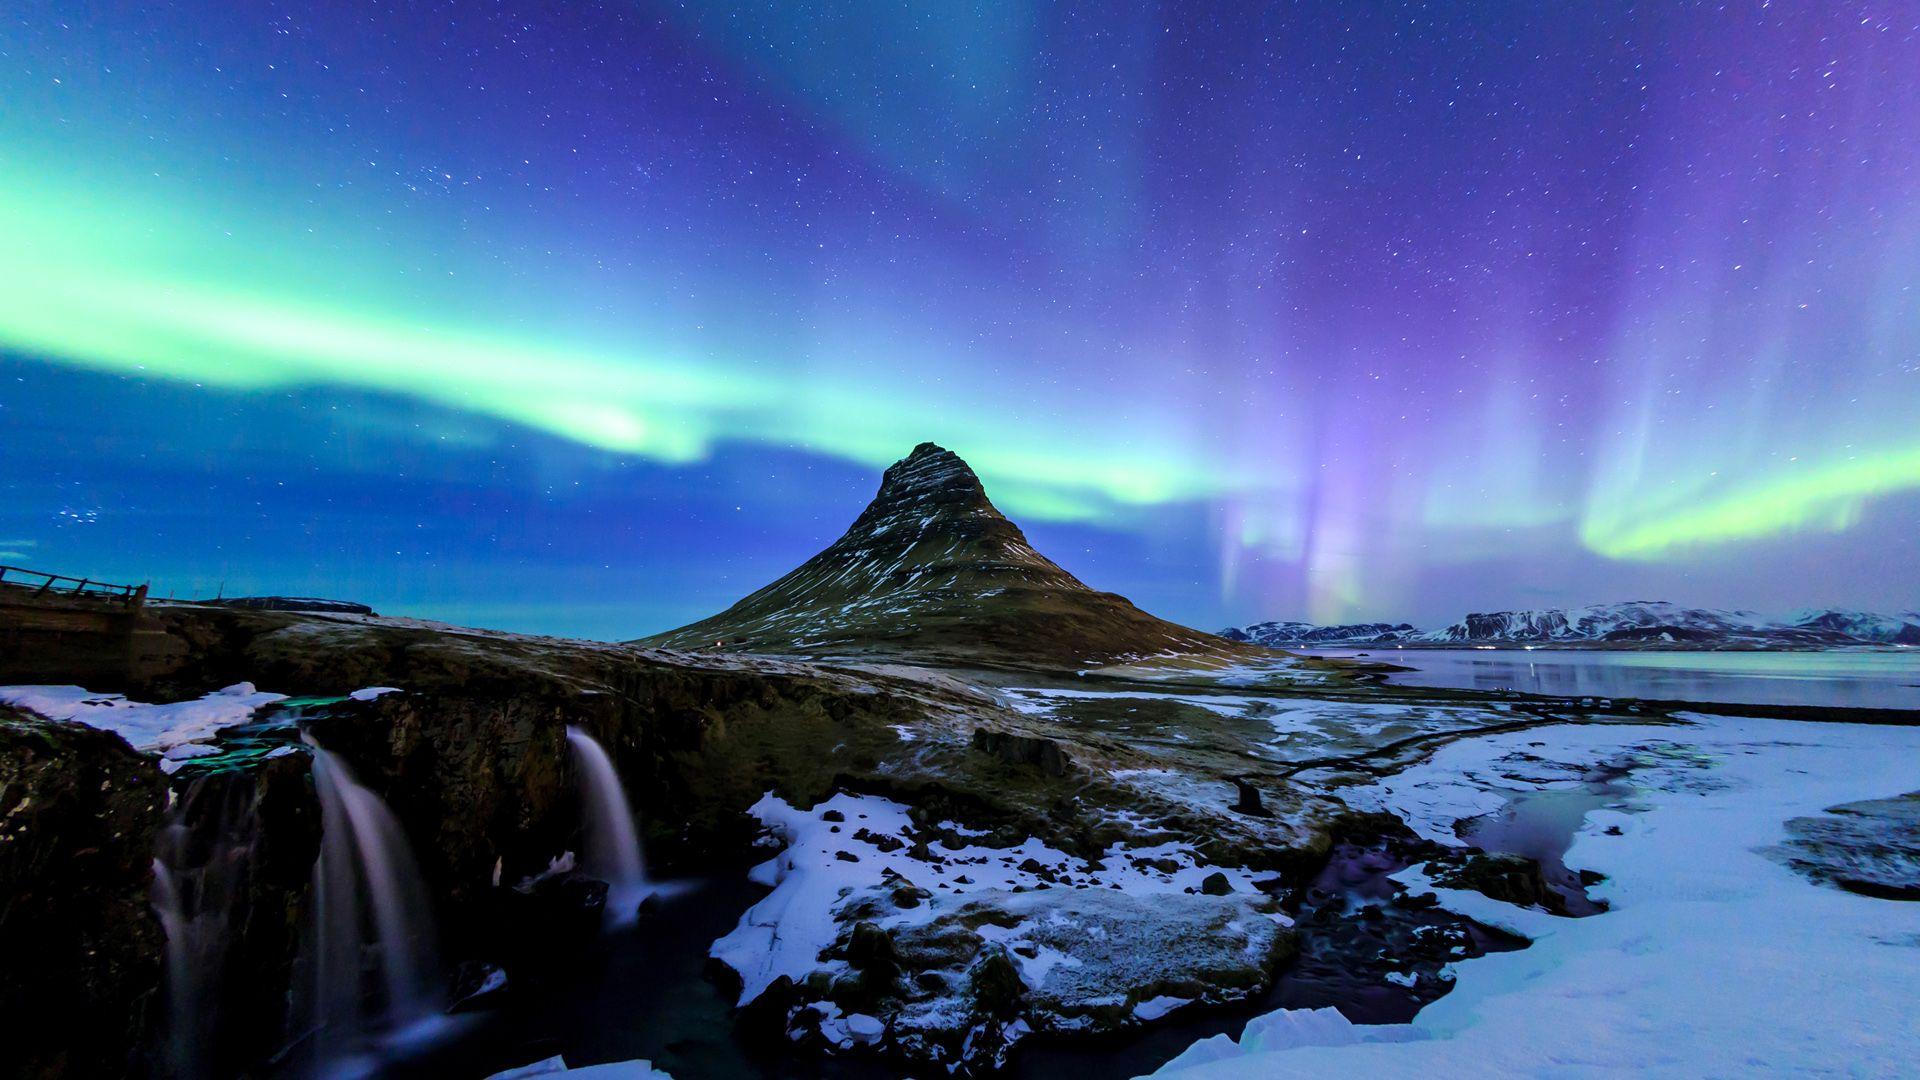 Iceland full hd 1080p wallpaper